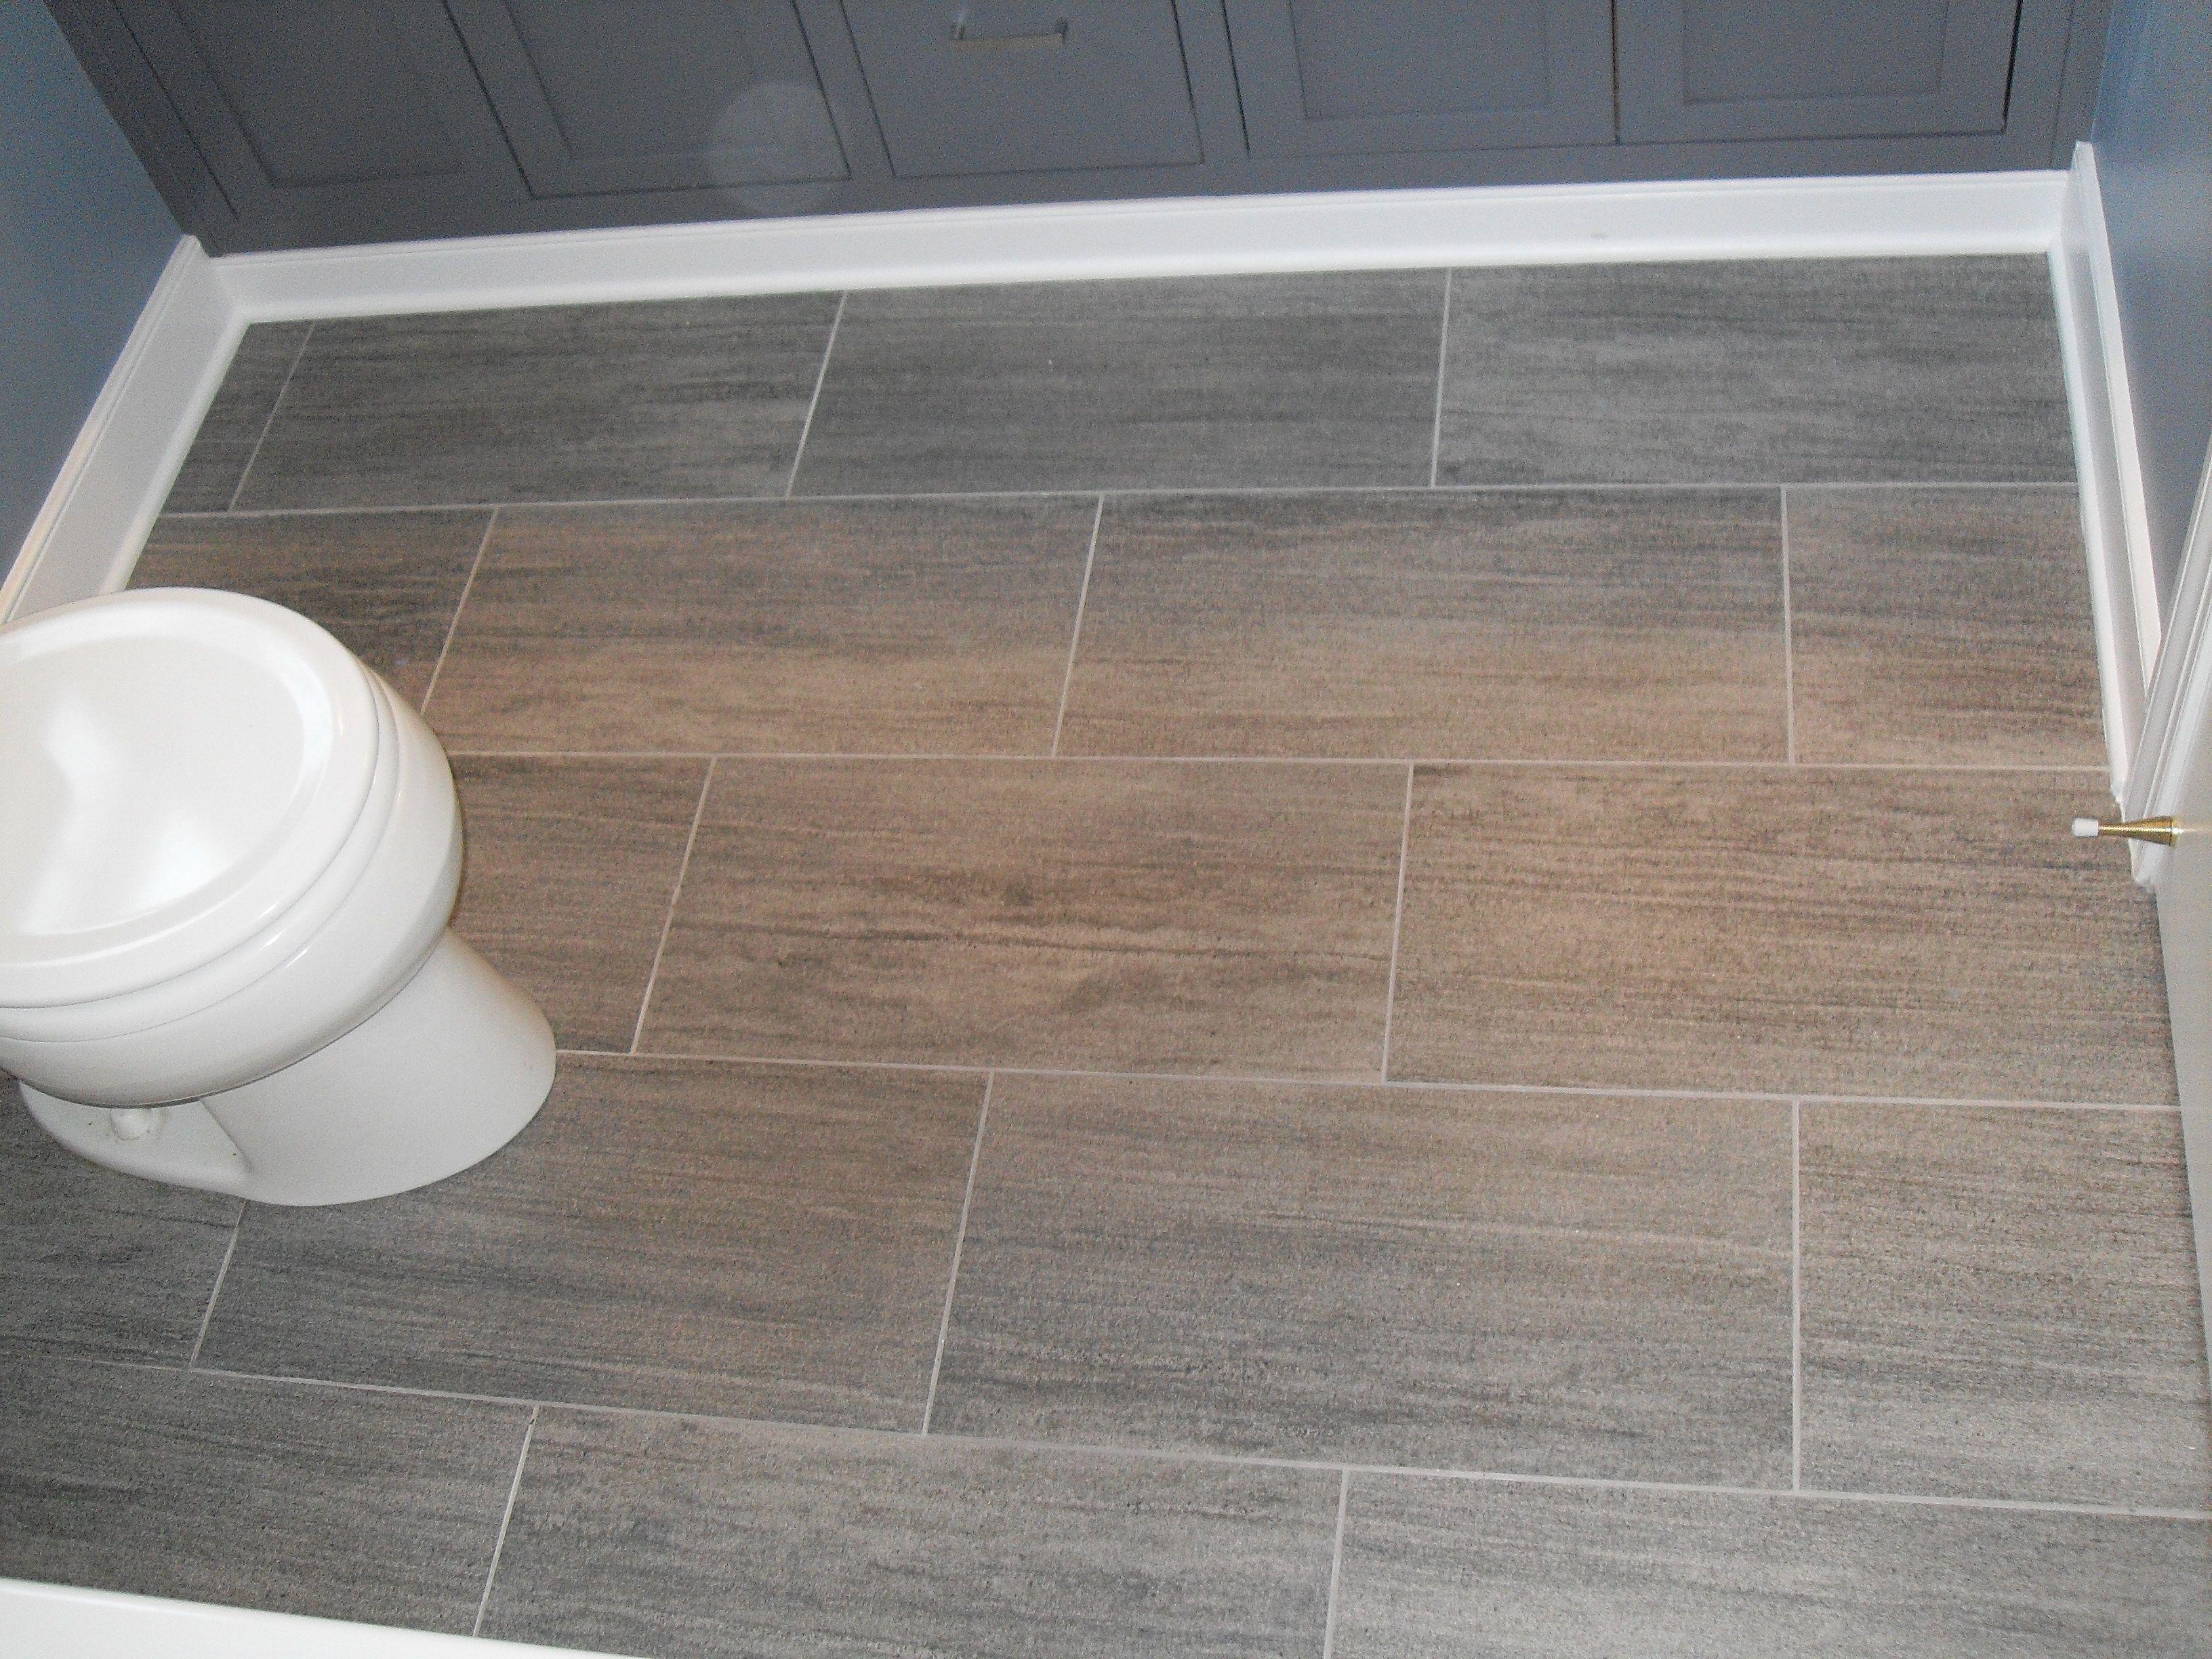 Bathroom laminate flooring nottingham bathroom pinterest cheap bathroom laminate flooring nottingham cheap bathroom tilescheap dailygadgetfo Image collections